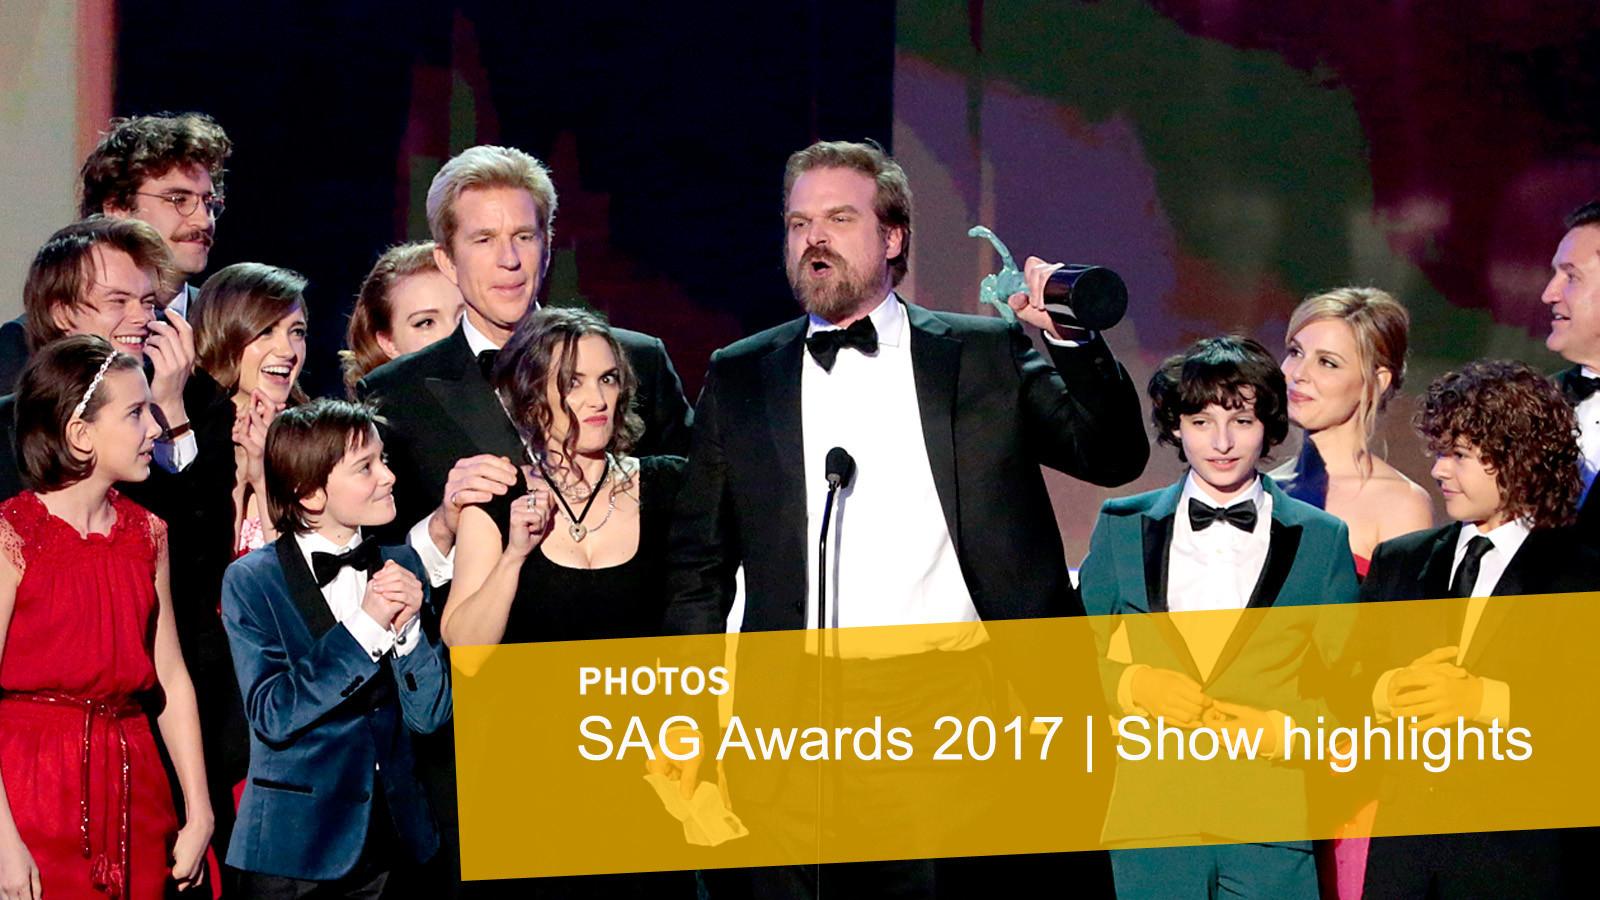 2017 SAG Awards show highlights - LA Times